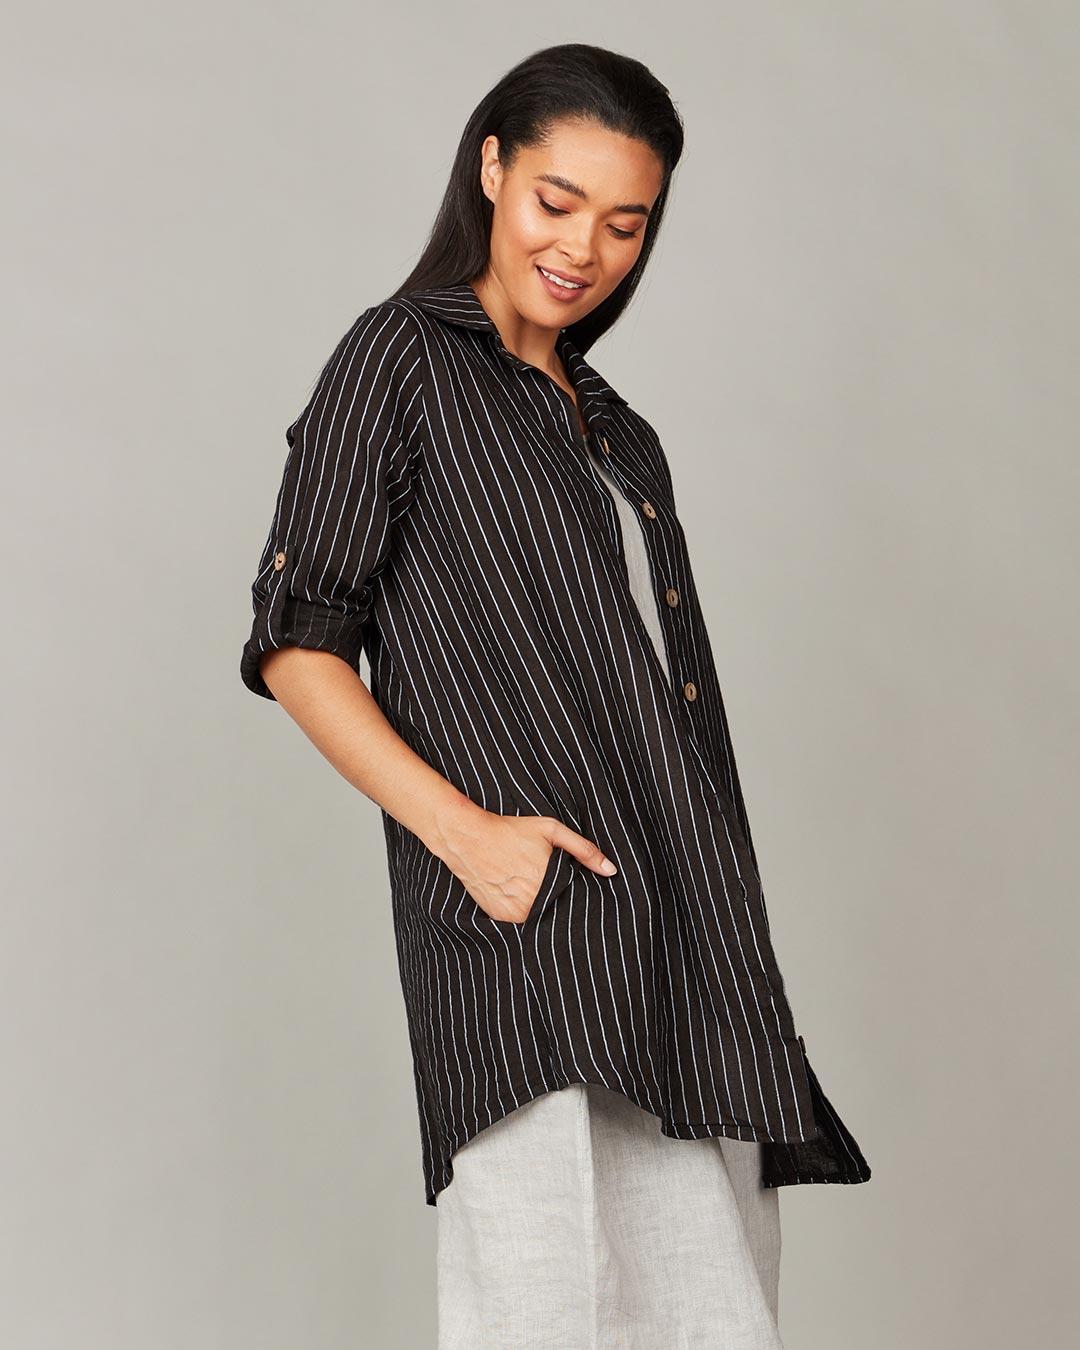 pistache-clothing-pinstripe-shirtdress-white-dianes-lingerie-vancouver-1080x1080